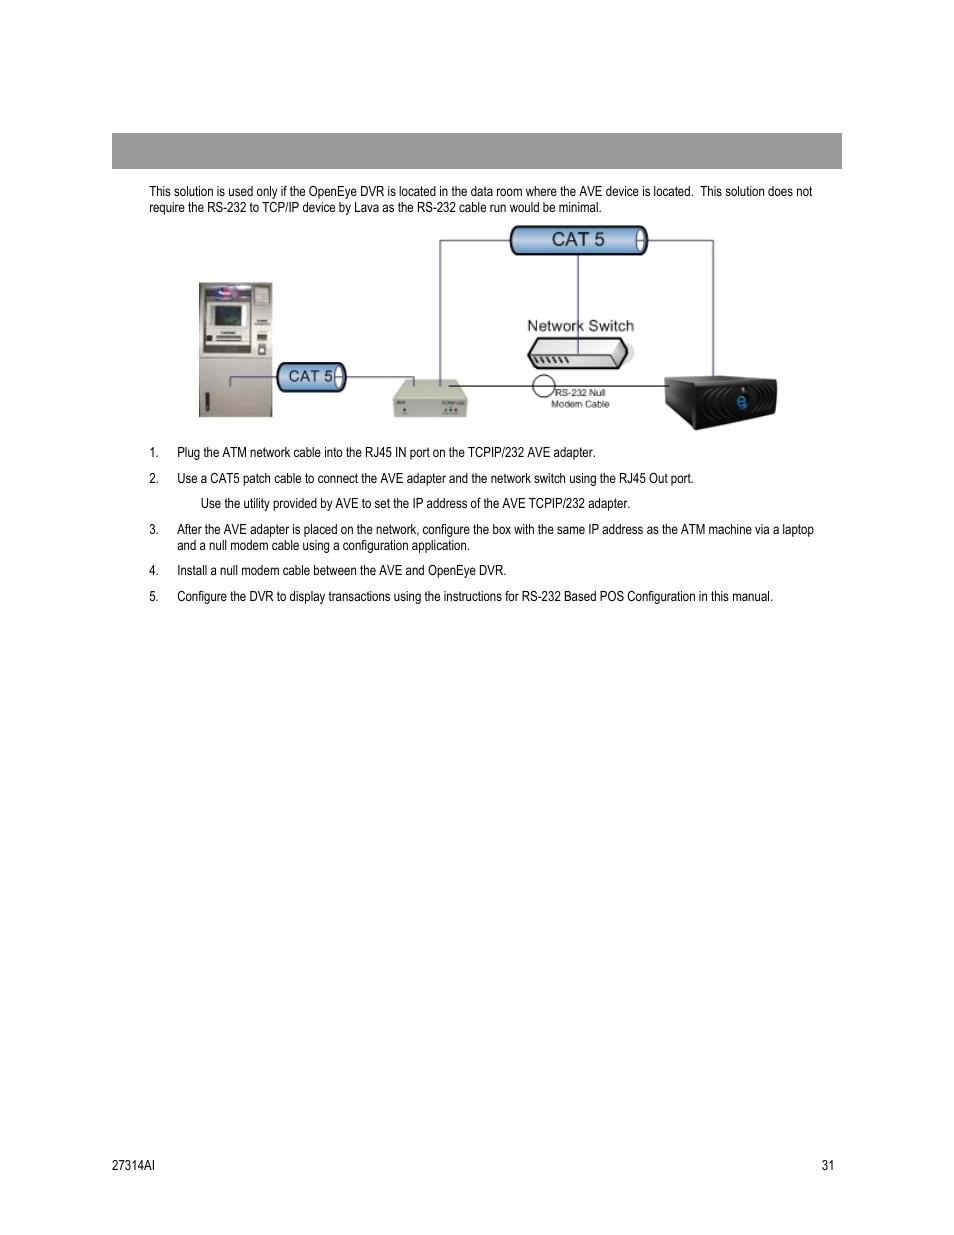 in room installation configuration openeye sw rwtcp user manual in room installation configuration openeye sw rwtcp user manual page 31 51